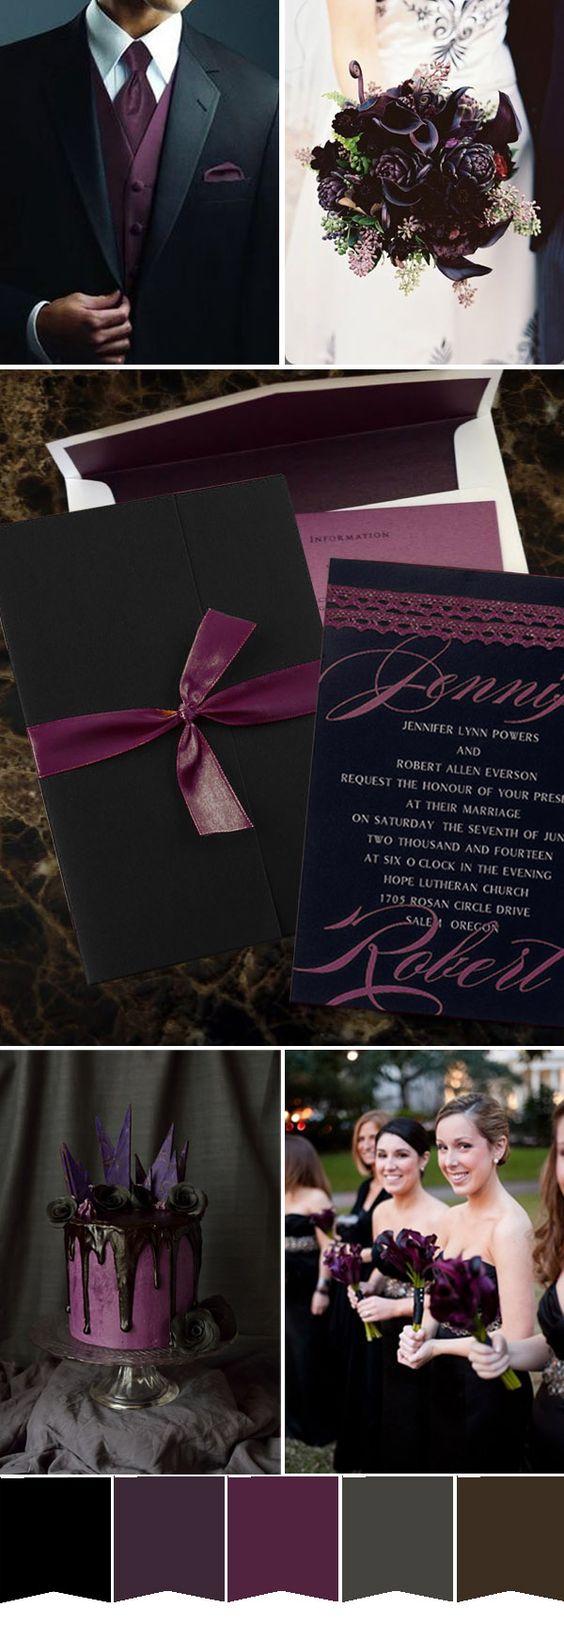 dark purple and black wedding color ideas and wedding invitations